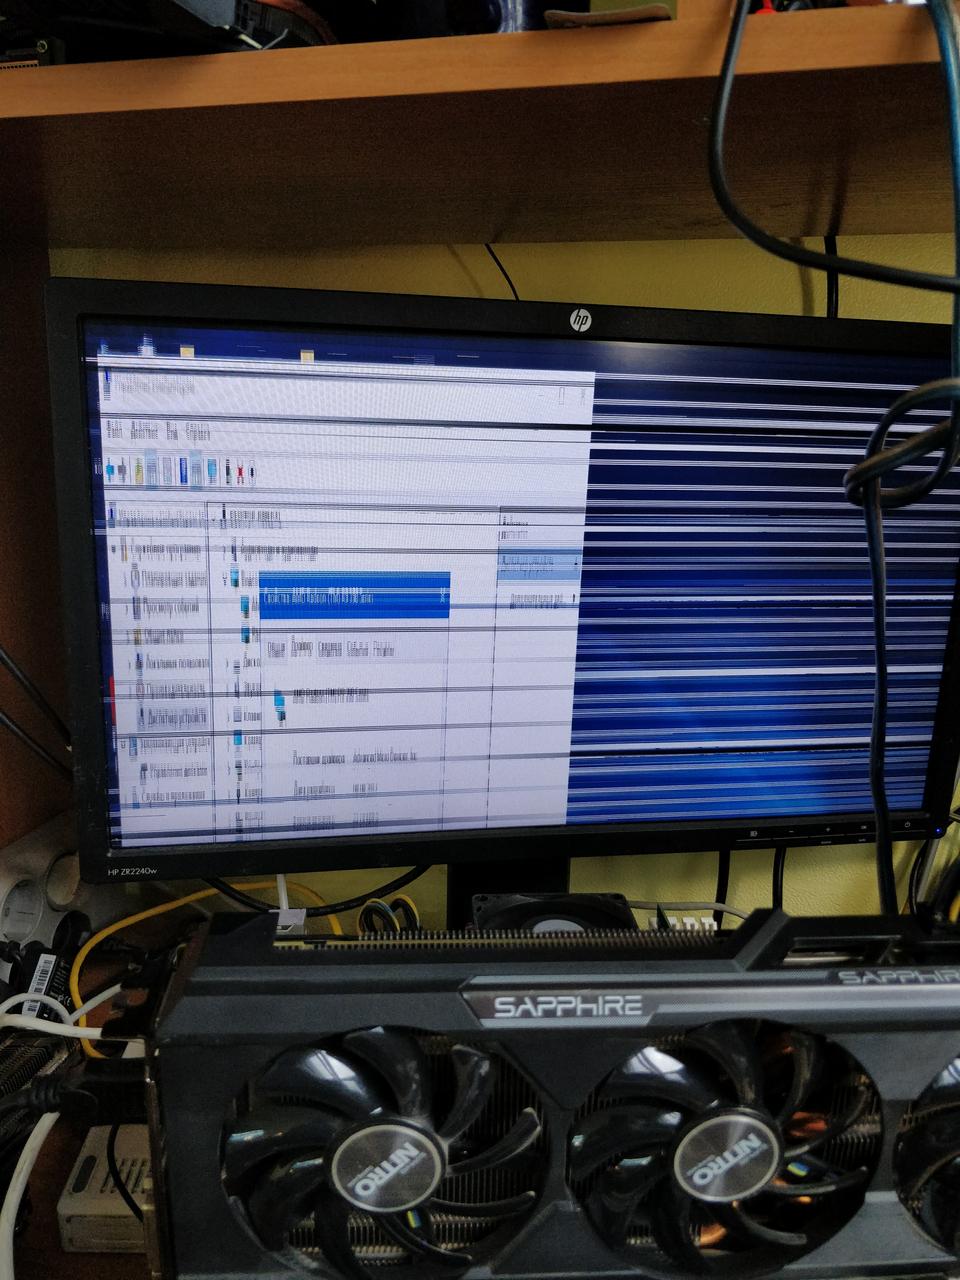 ремонт, реболл, замена видеочипа, RX 470, RX 480, RX 570, RX 580, GTX 1060, GTX 1070, GTX 1080, GTX 1080 Ti